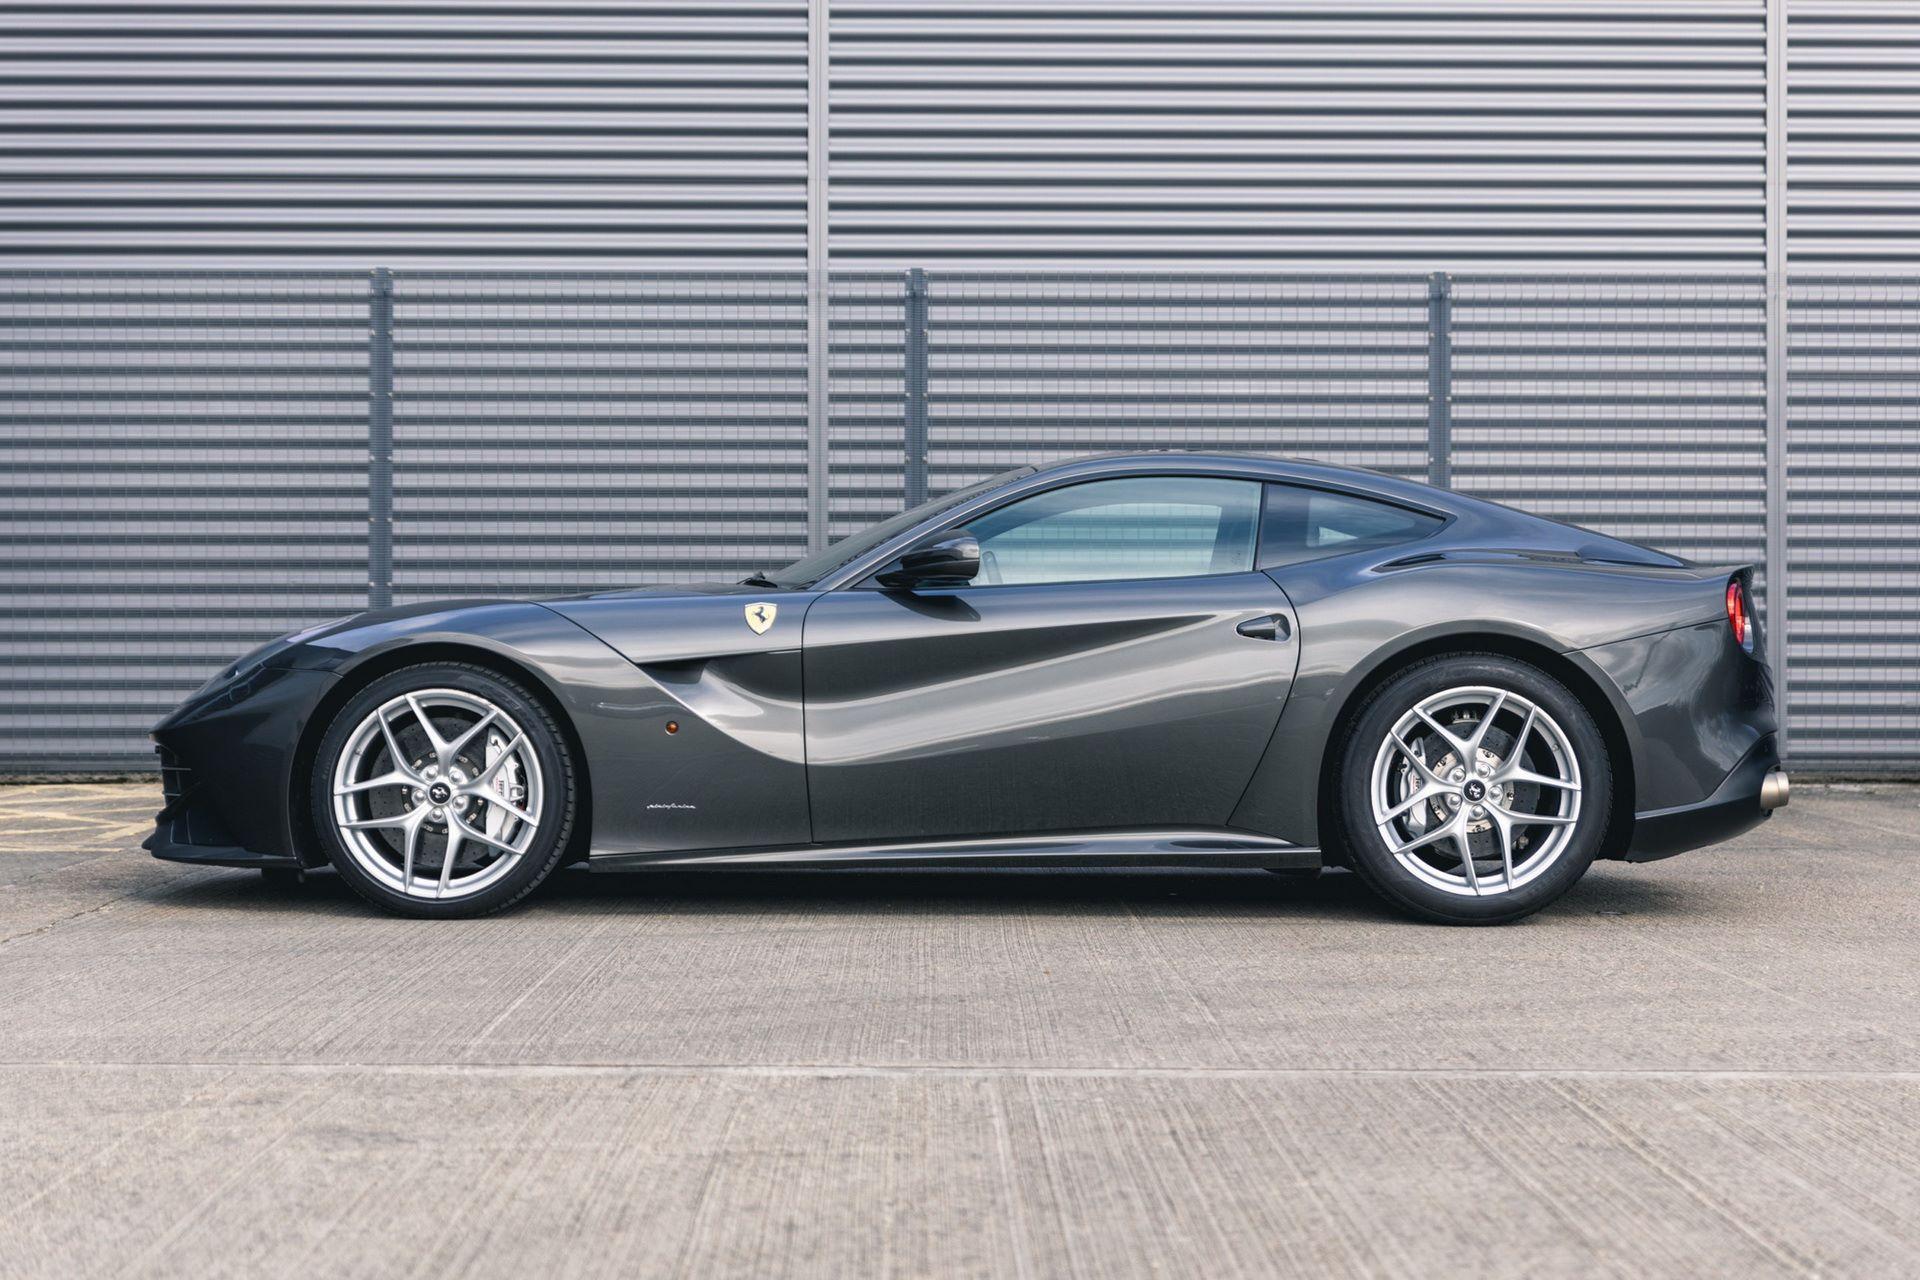 Ferrari-F12berlinetta-Chris-Harris-10